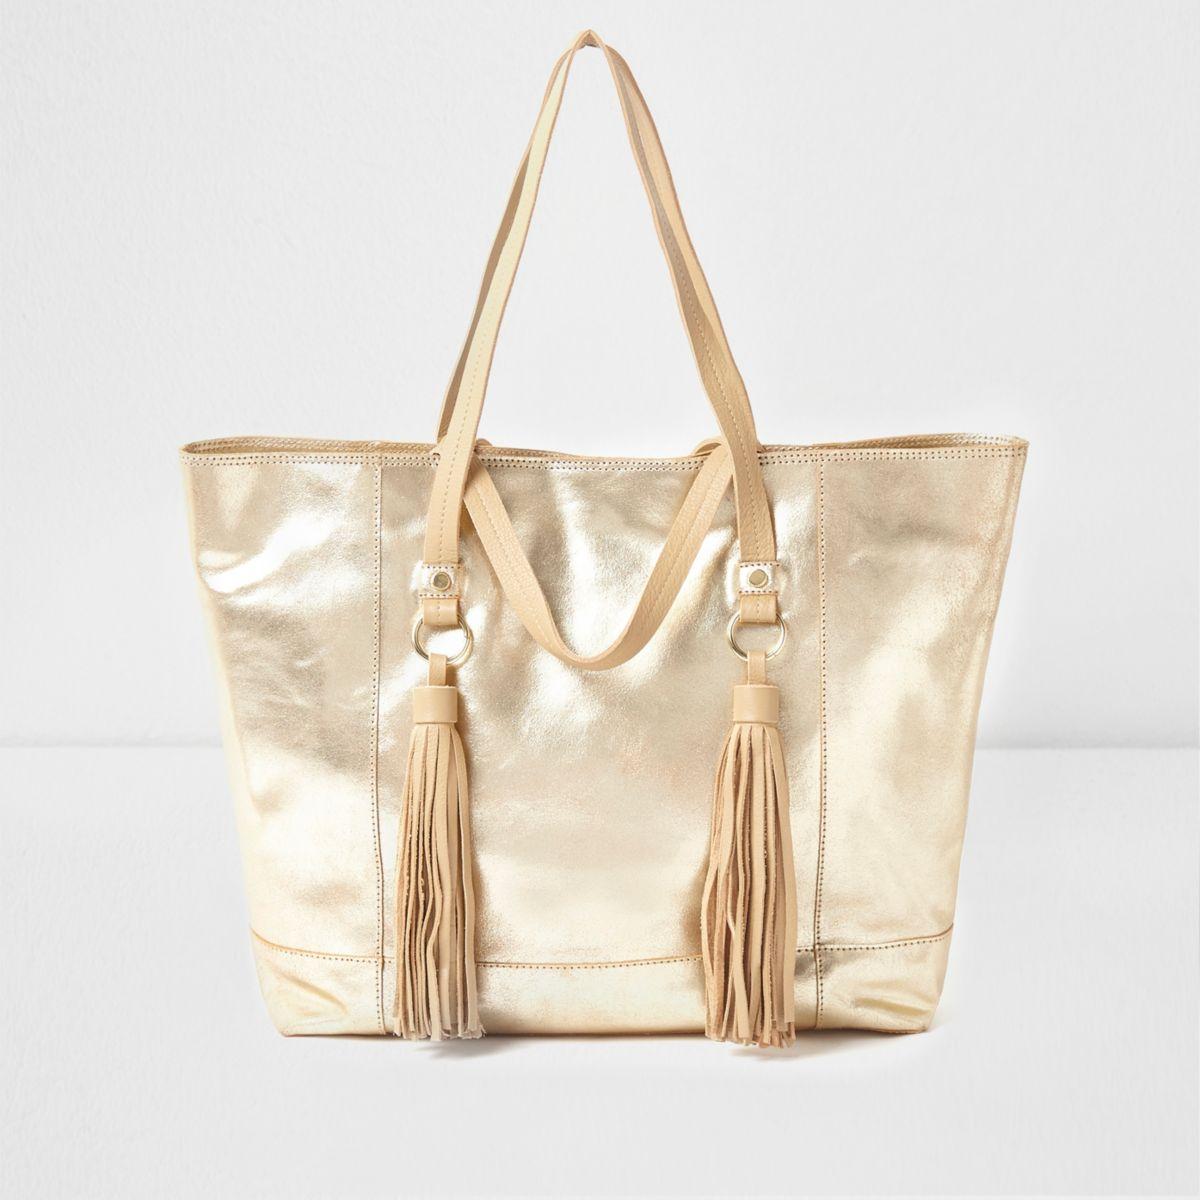 Metallic gold leather tassel large tote bag